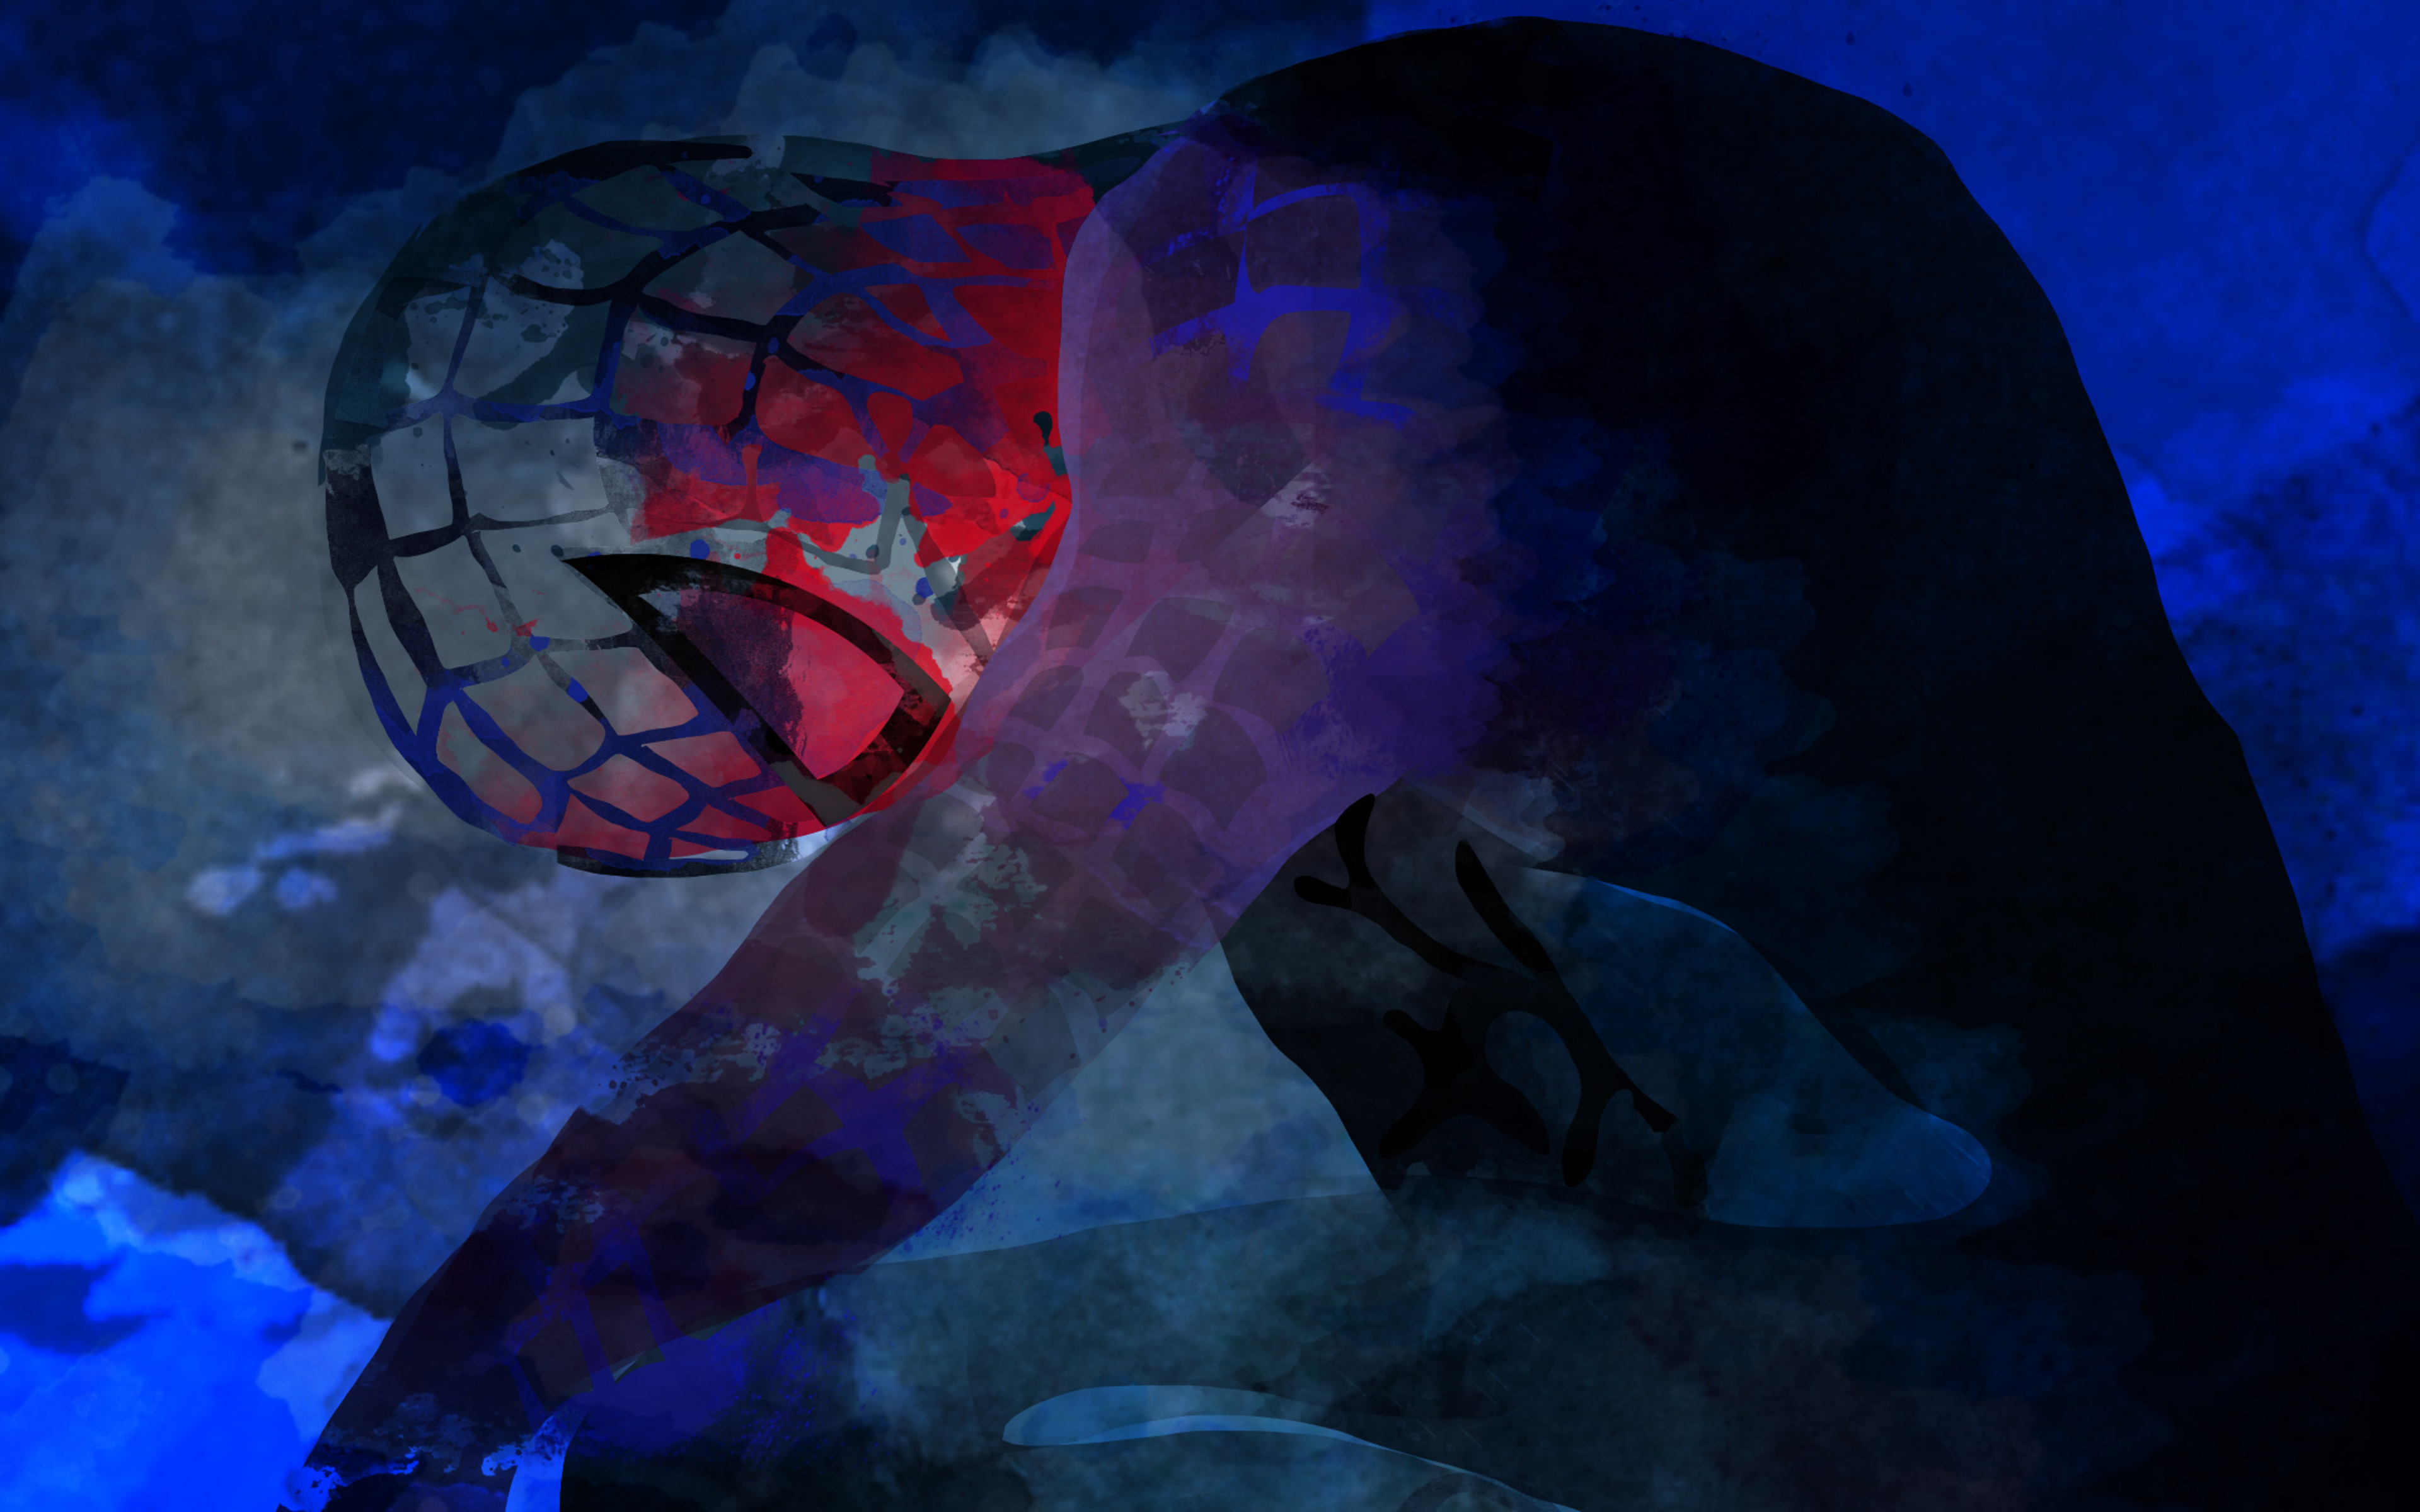 spiderman-watercolor-art-bk.jpg